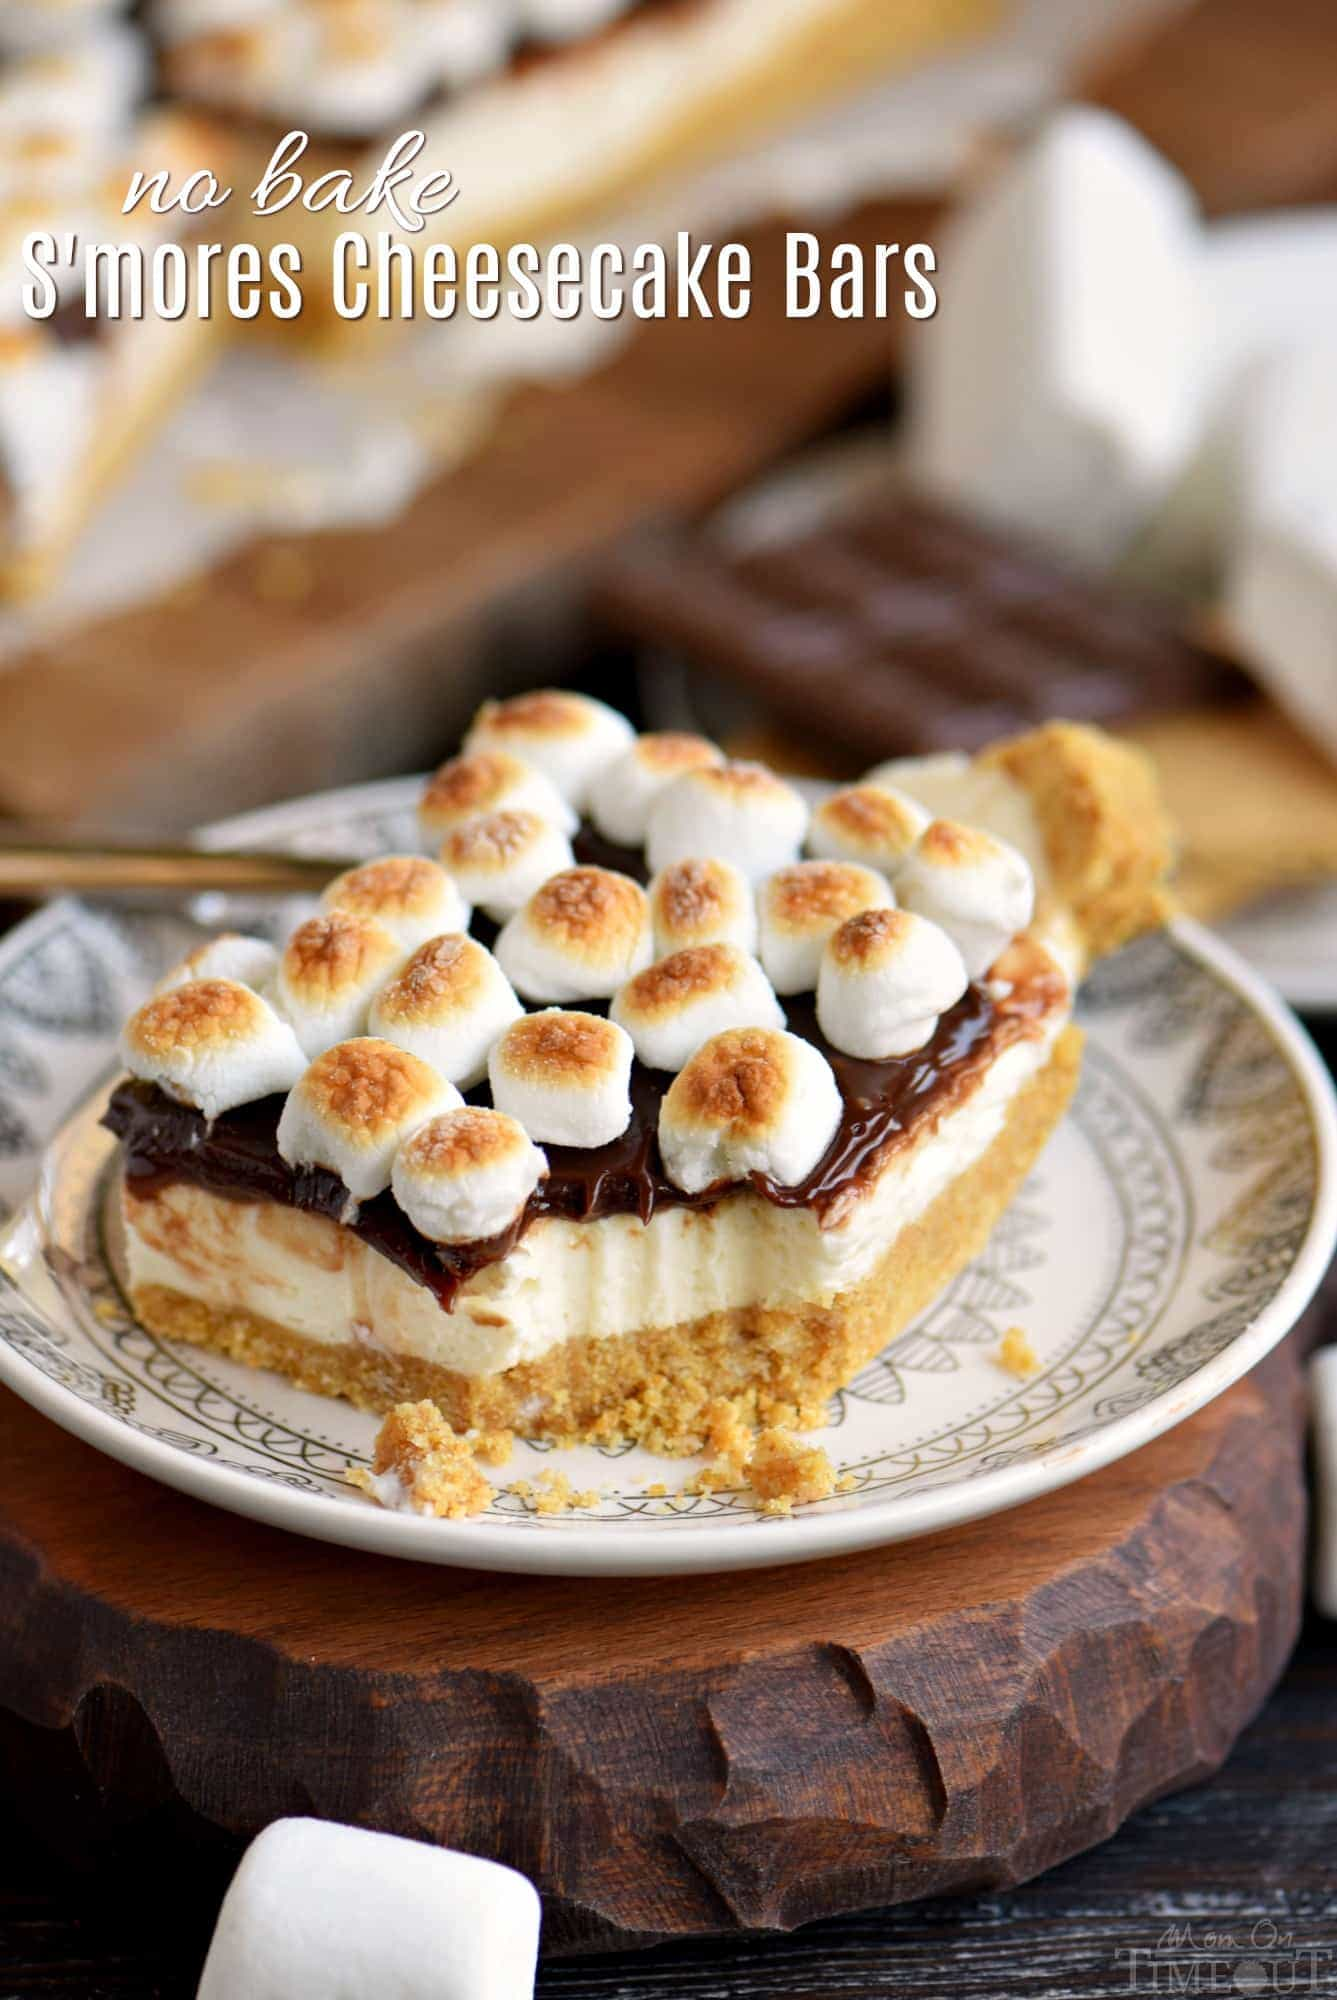 No-Bake Smores Cheesecake Bars | 17+ No-Bake Cheesecake Recipes